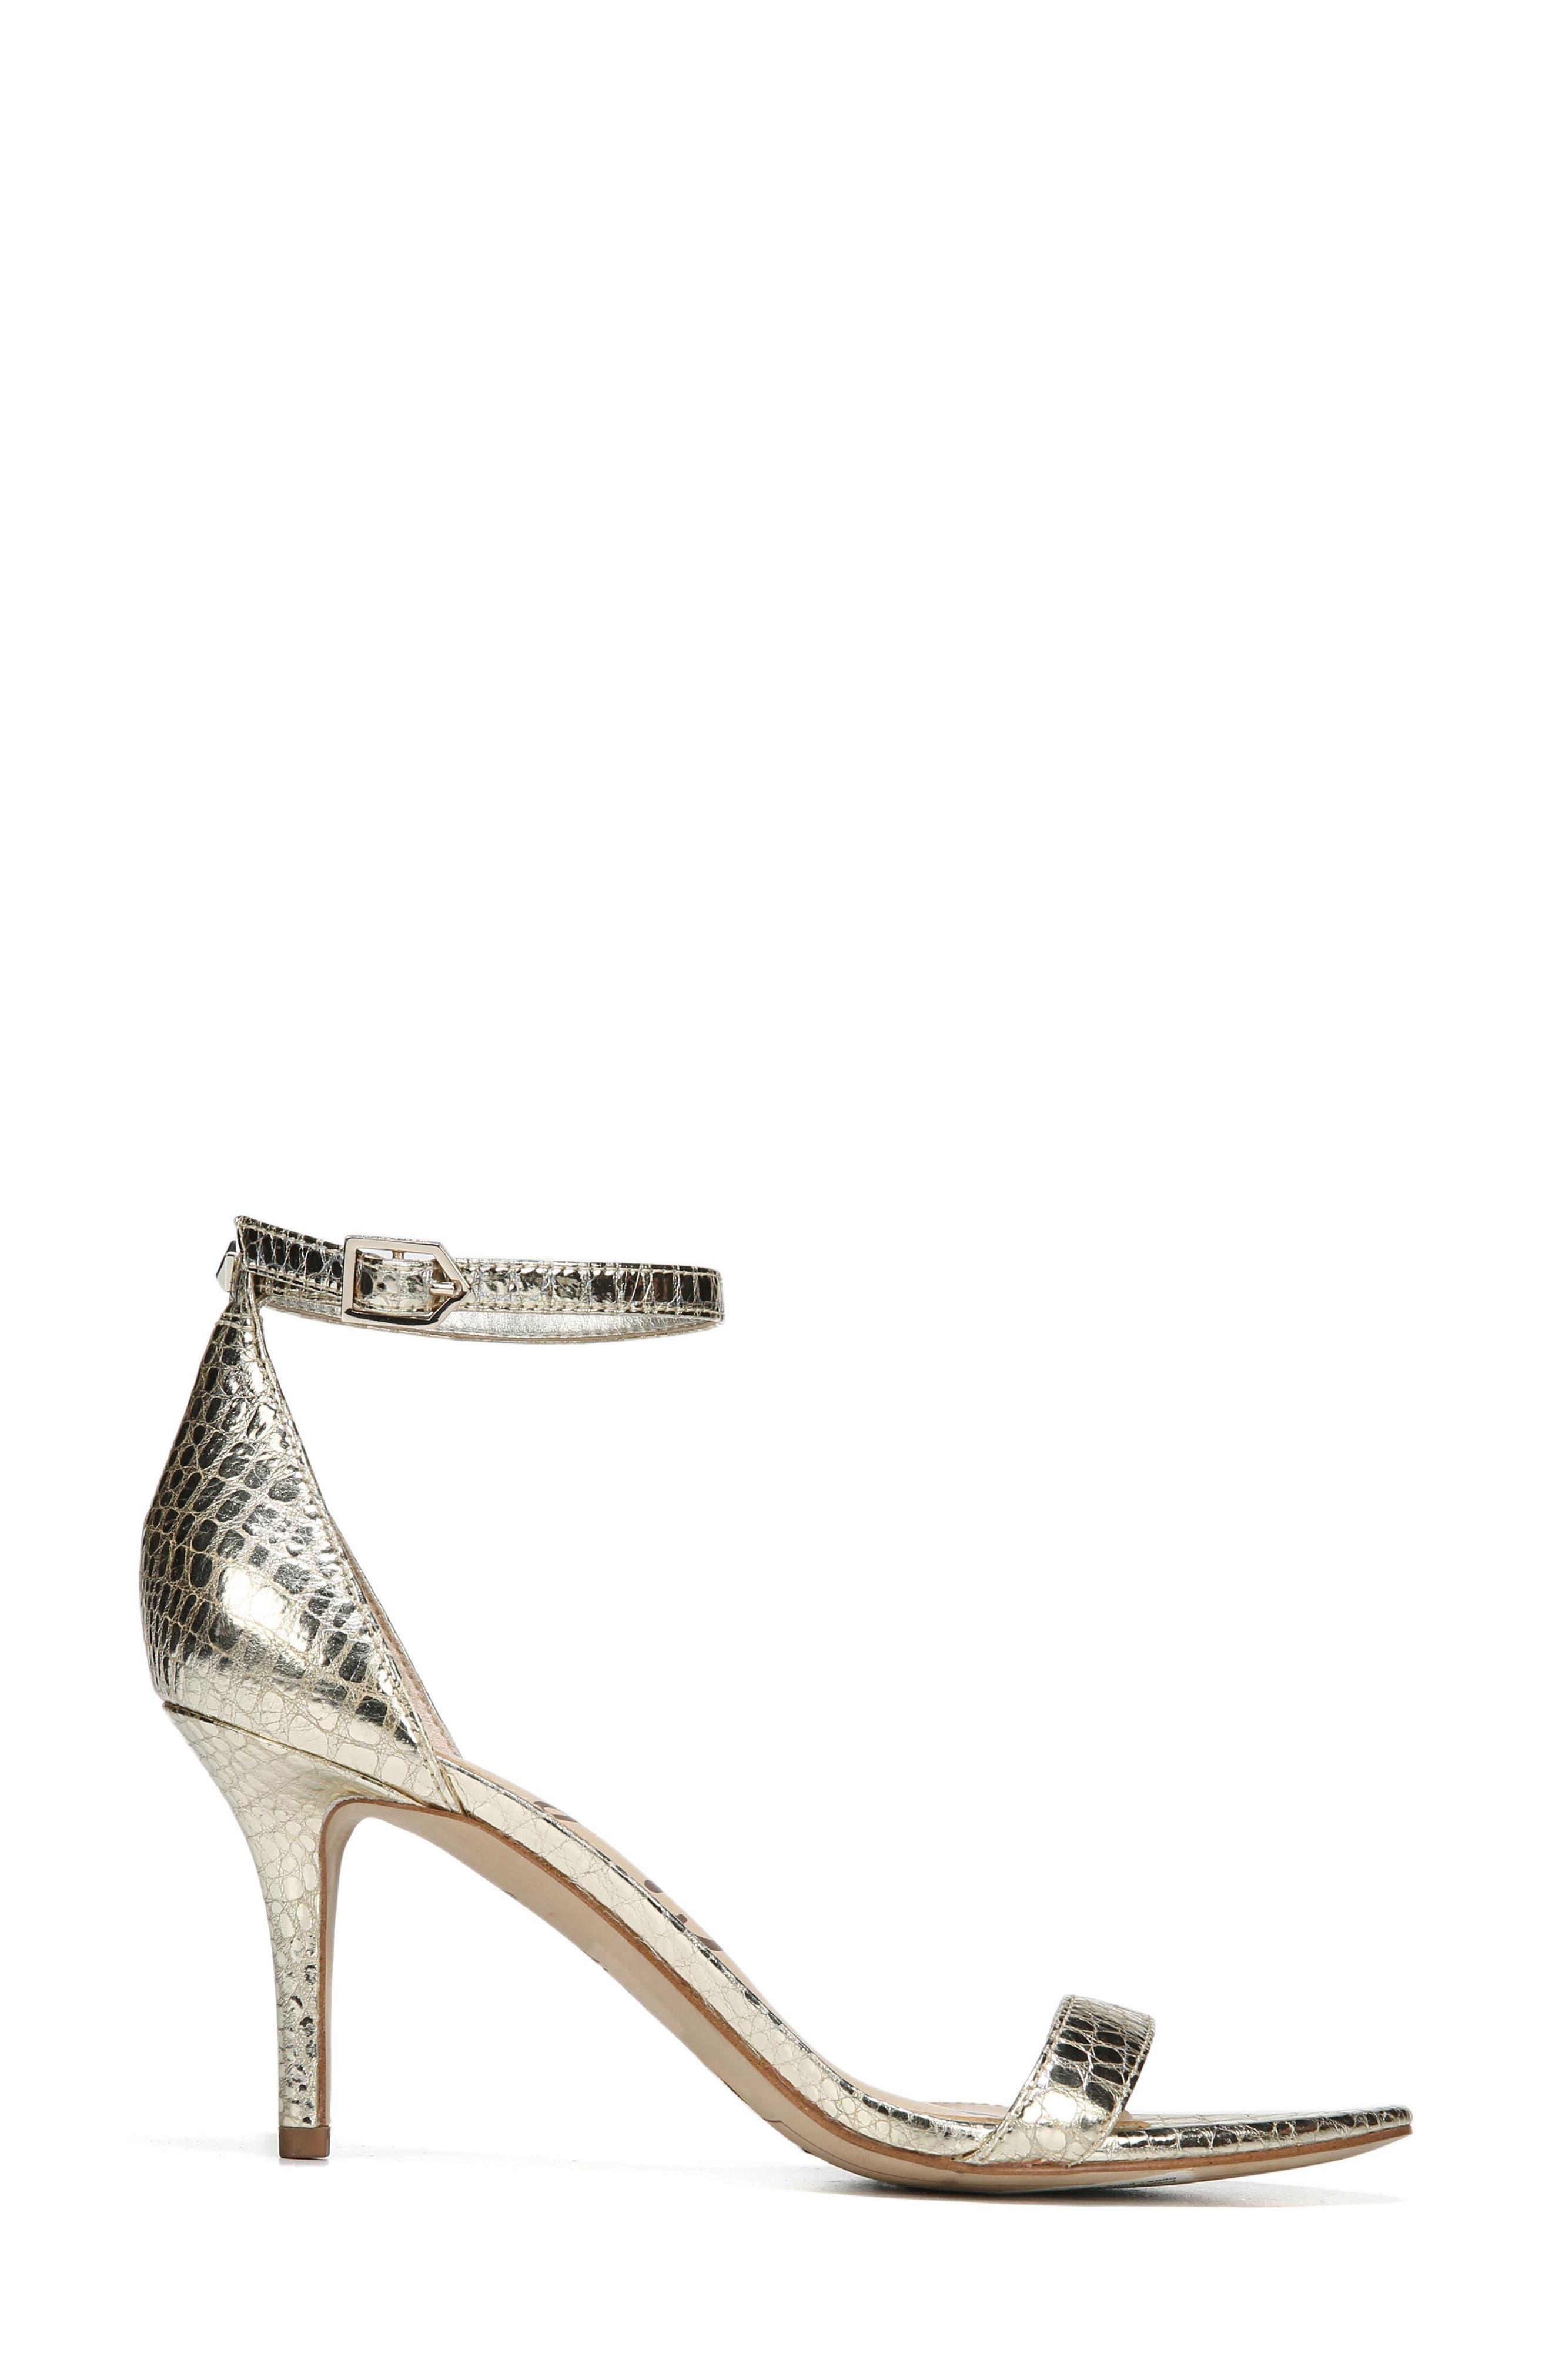 ,                             'Patti' Ankle Strap Sandal,                             Alternate thumbnail 136, color,                             909